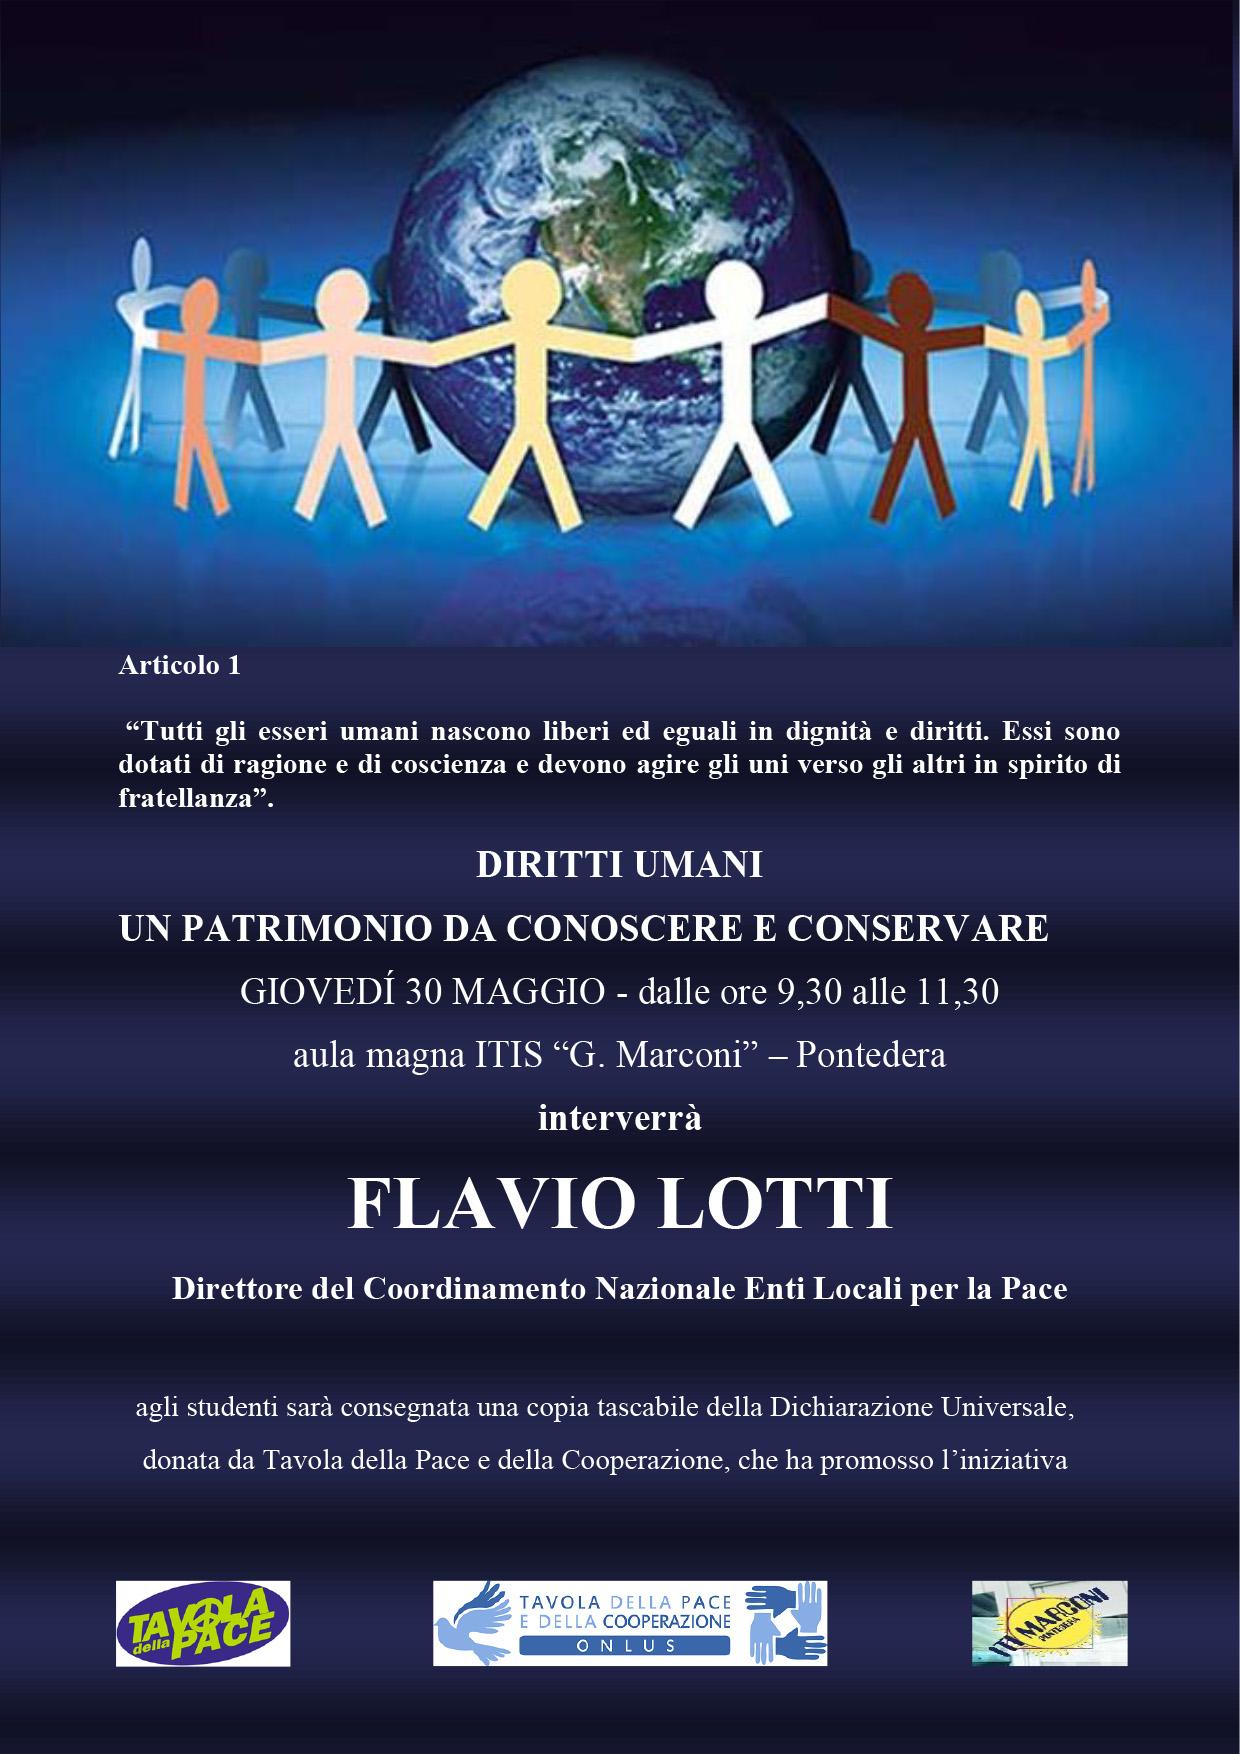 2219.05.30 Flavio Lotti incontra studenti Itis Pontedera